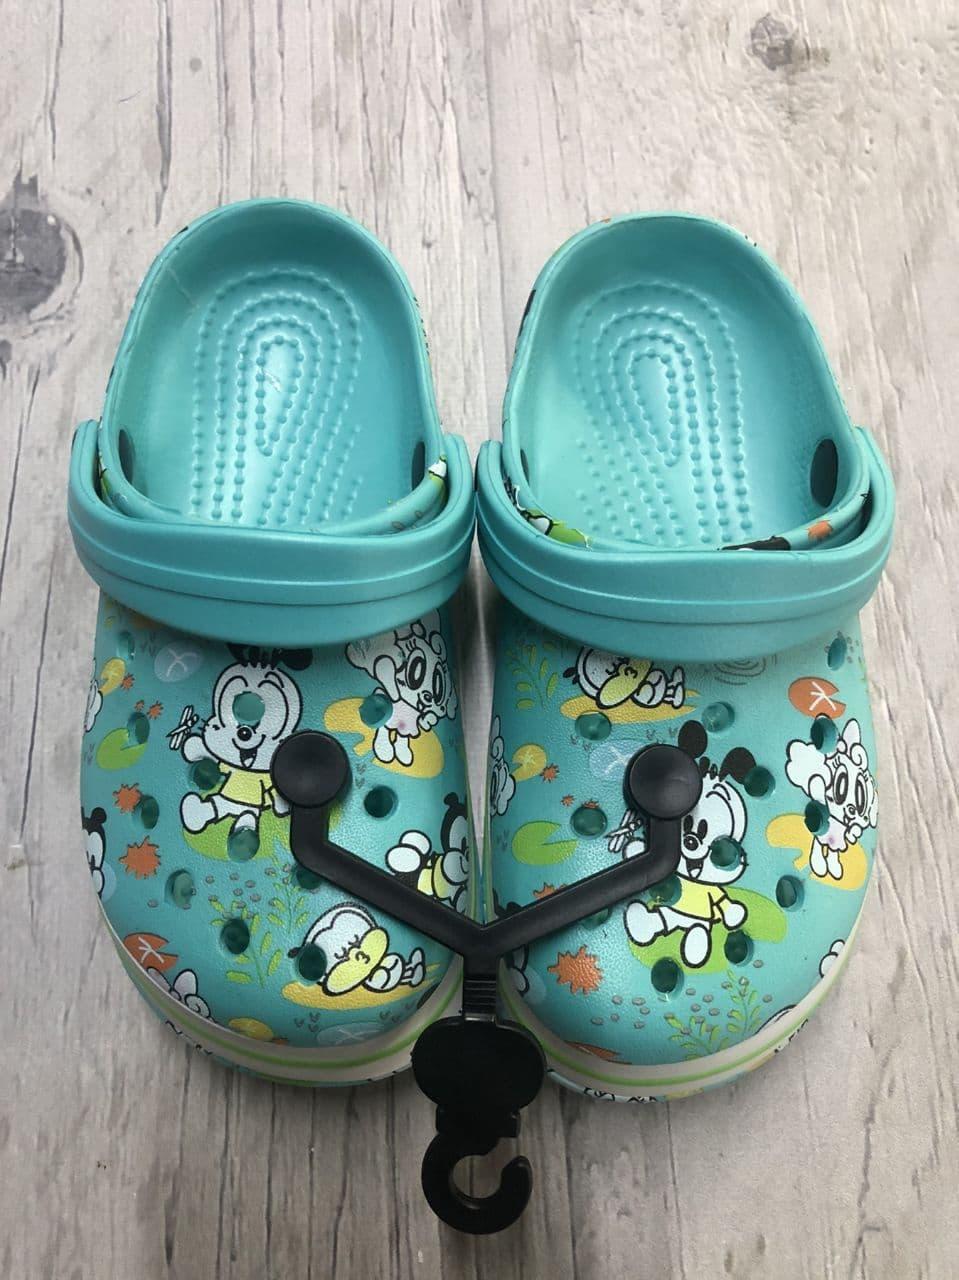 Сабо, Пляжная обувь Кроксы бирюзовые Luckline размер 26/27